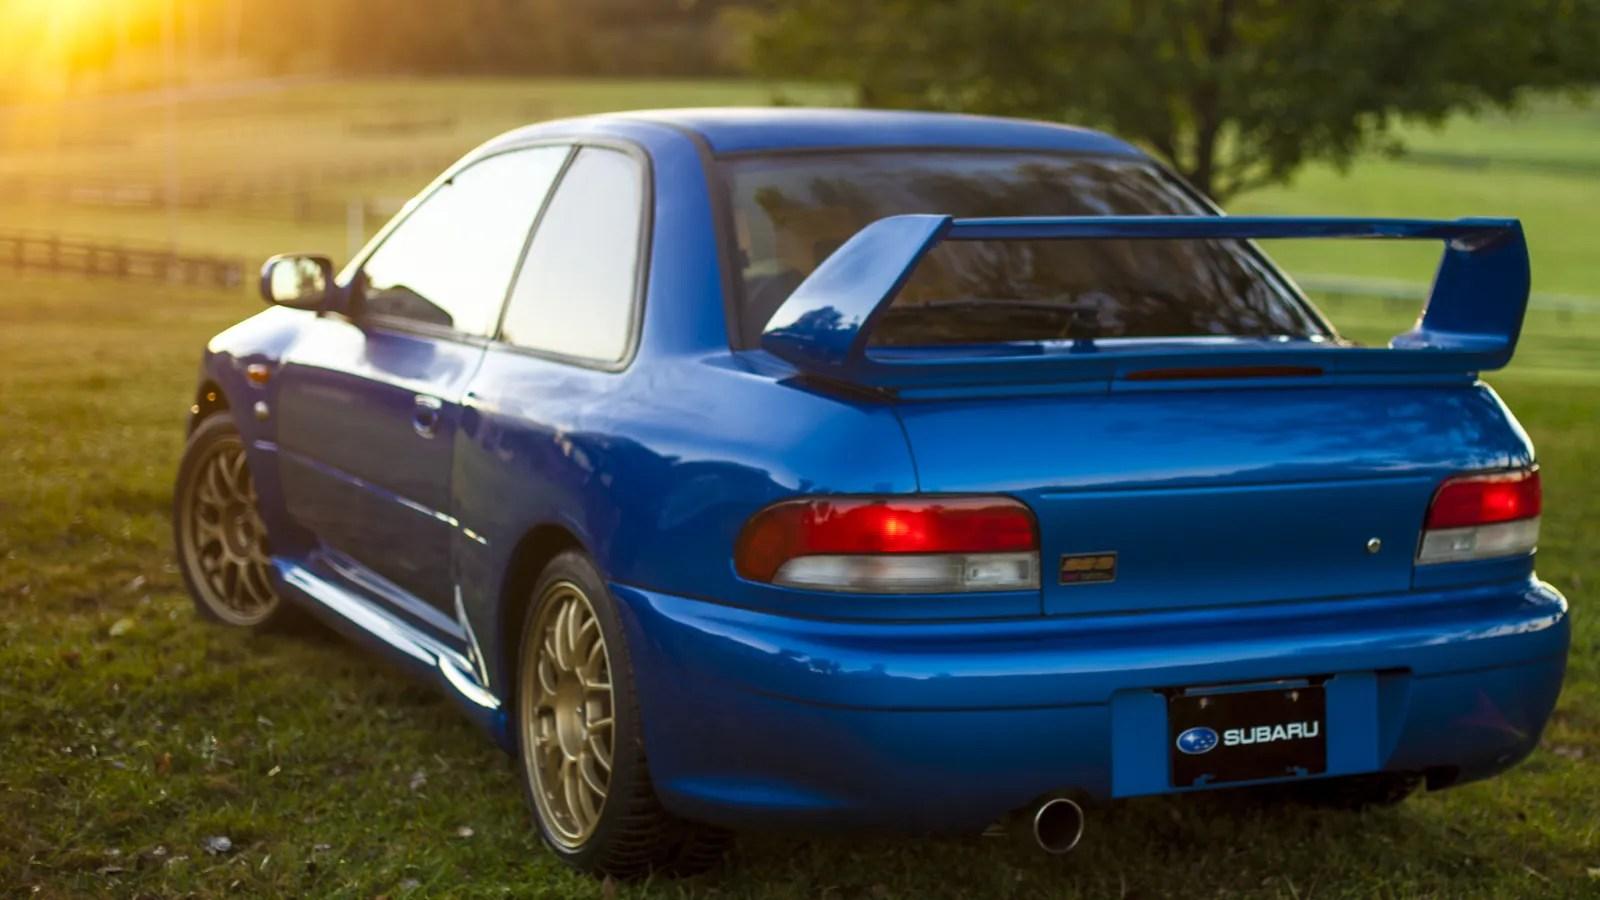 Wallpaper Import Cars The Impreza 22b Was The Ultimate Thoroughbred Subaru